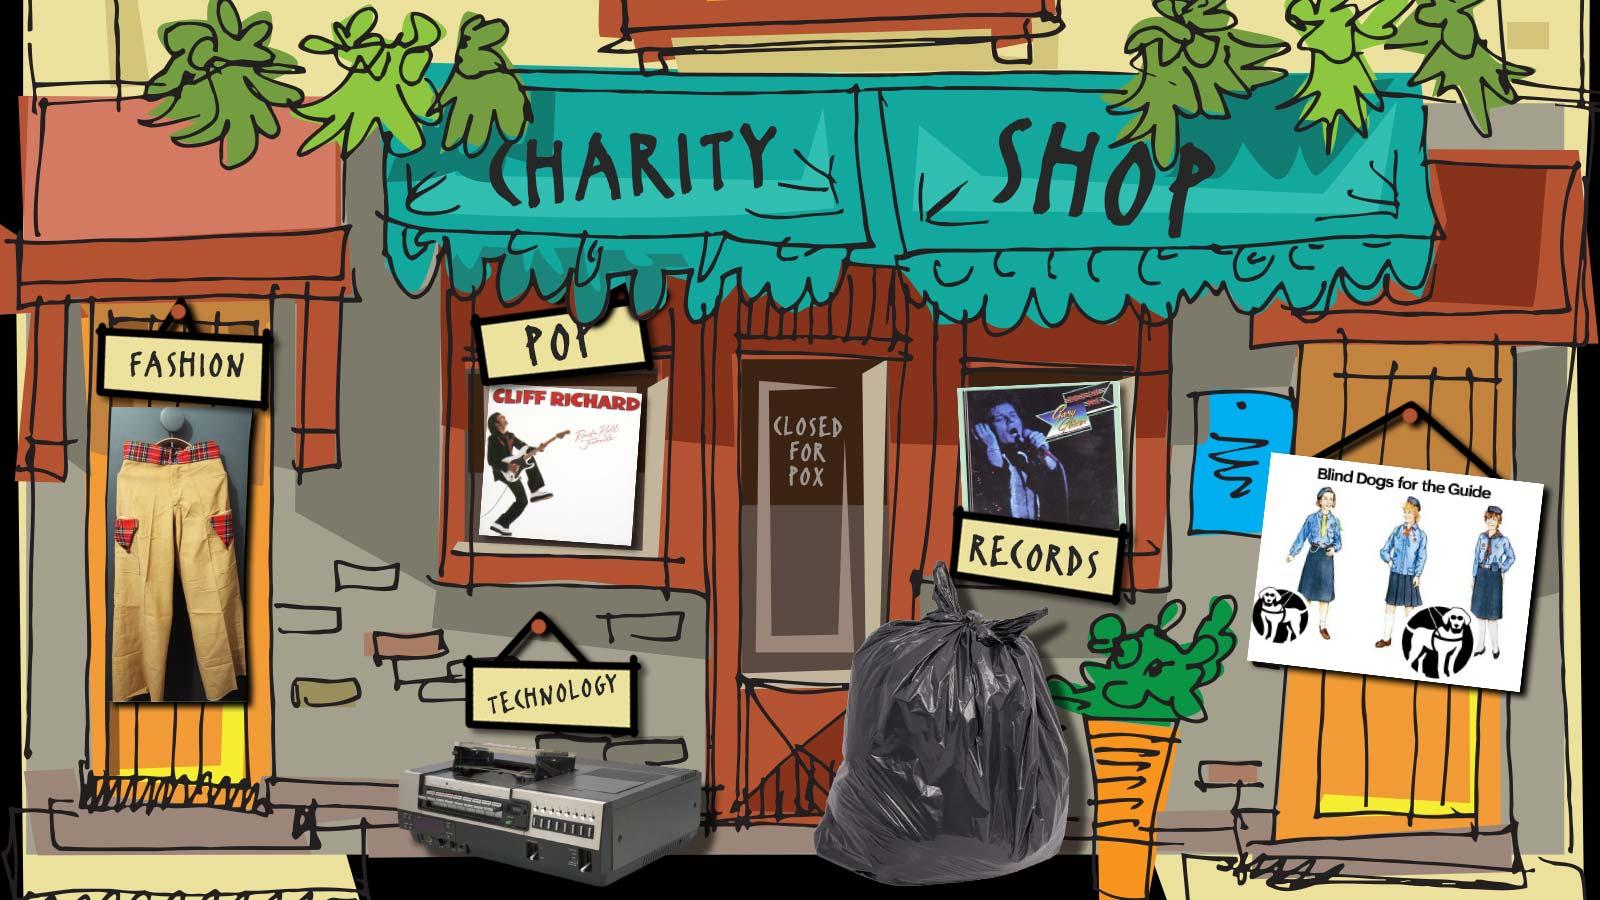 The Macc Lads Charity Shop